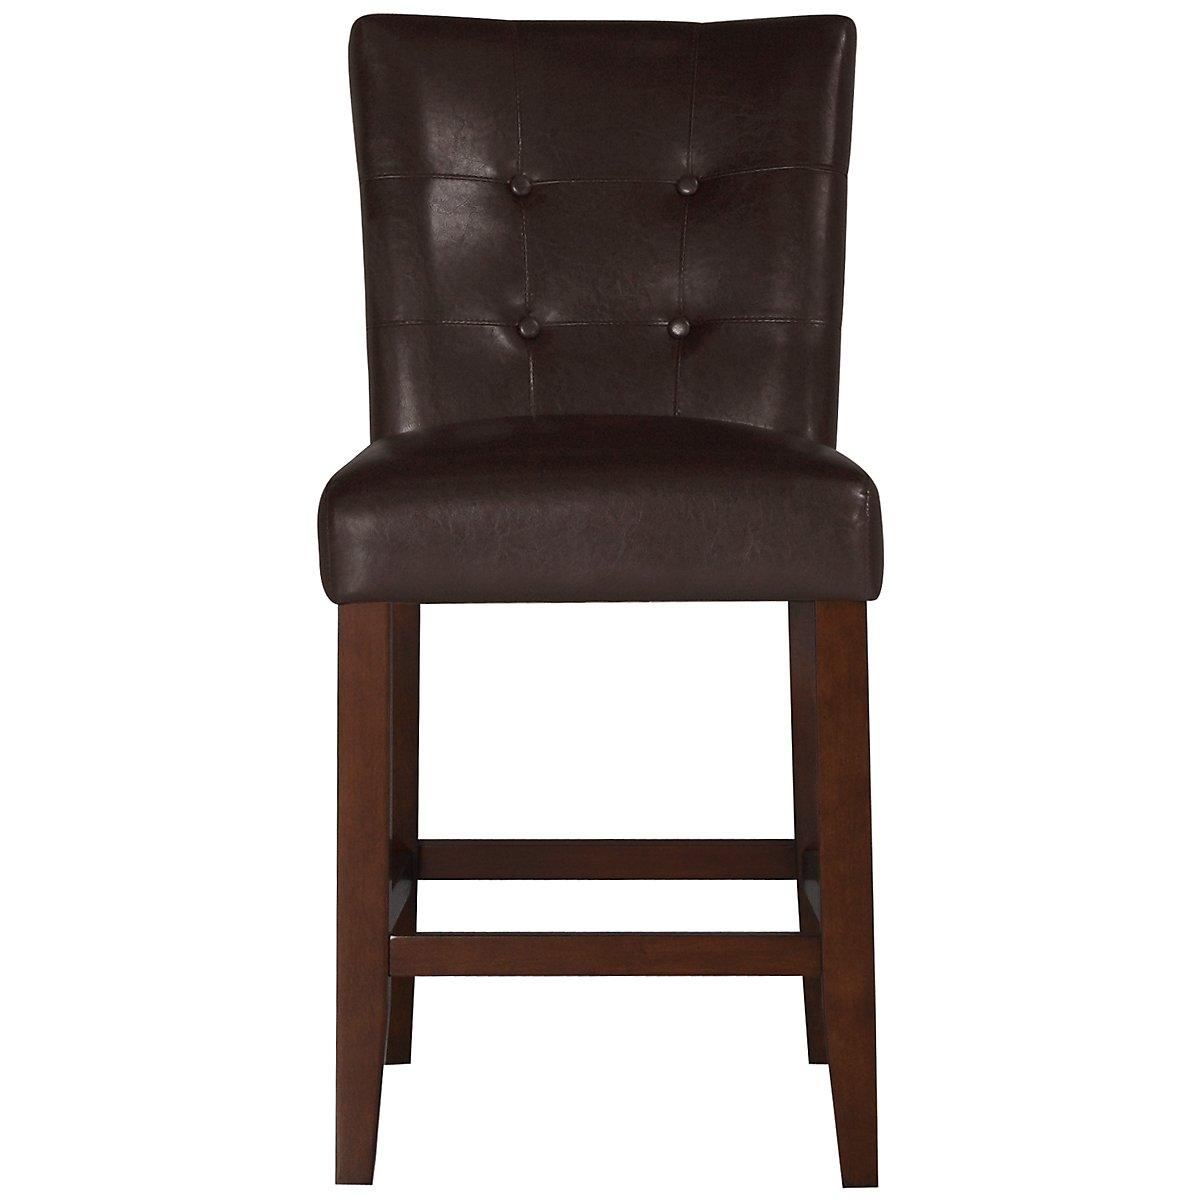 city lights dark brown 24 upholstered barstool dining chair